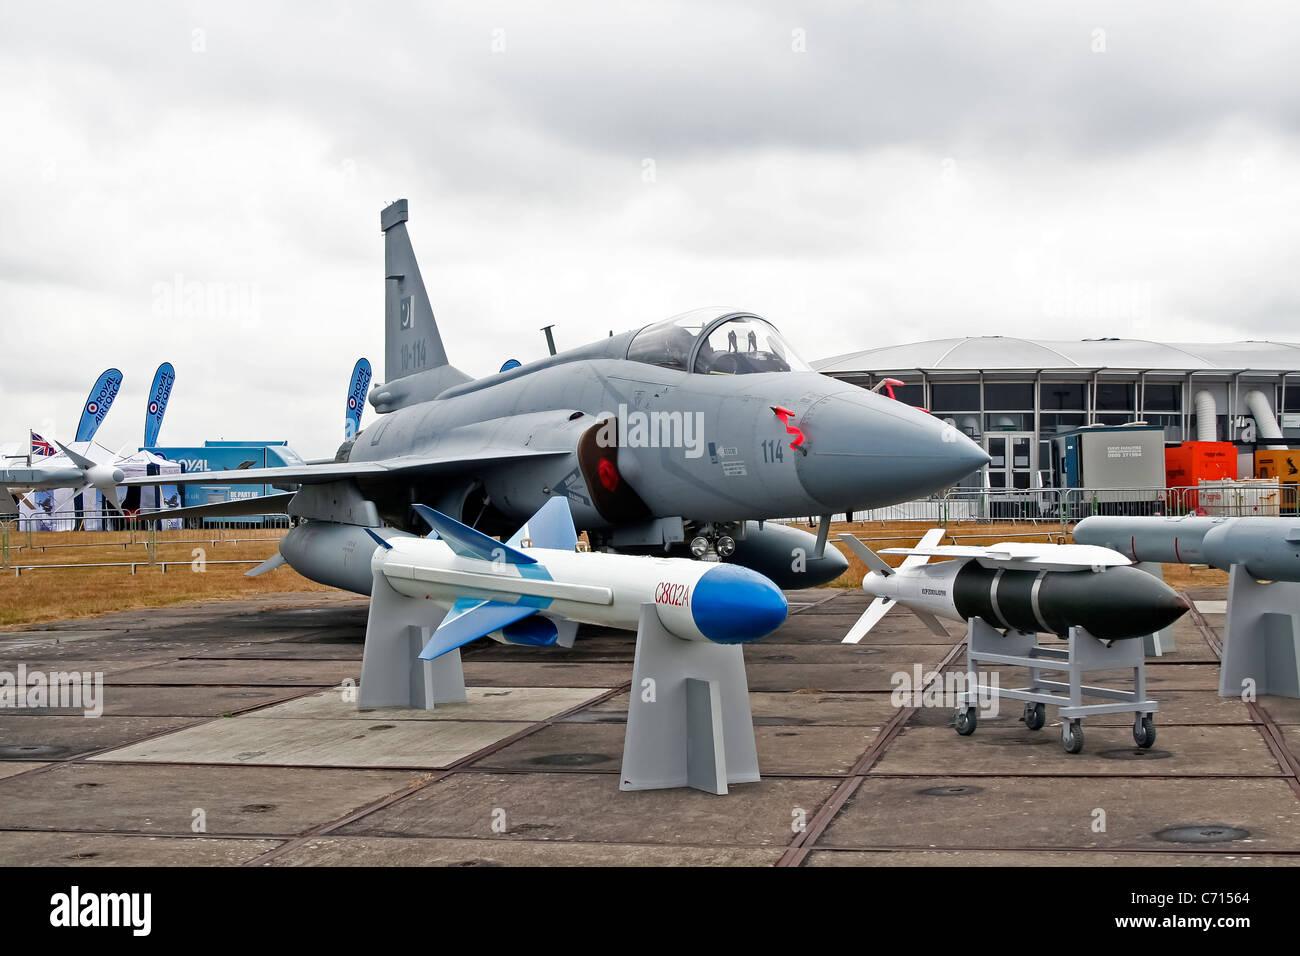 Pakistan Aeronautical Complex JF-17 Thunder 10-113 at the